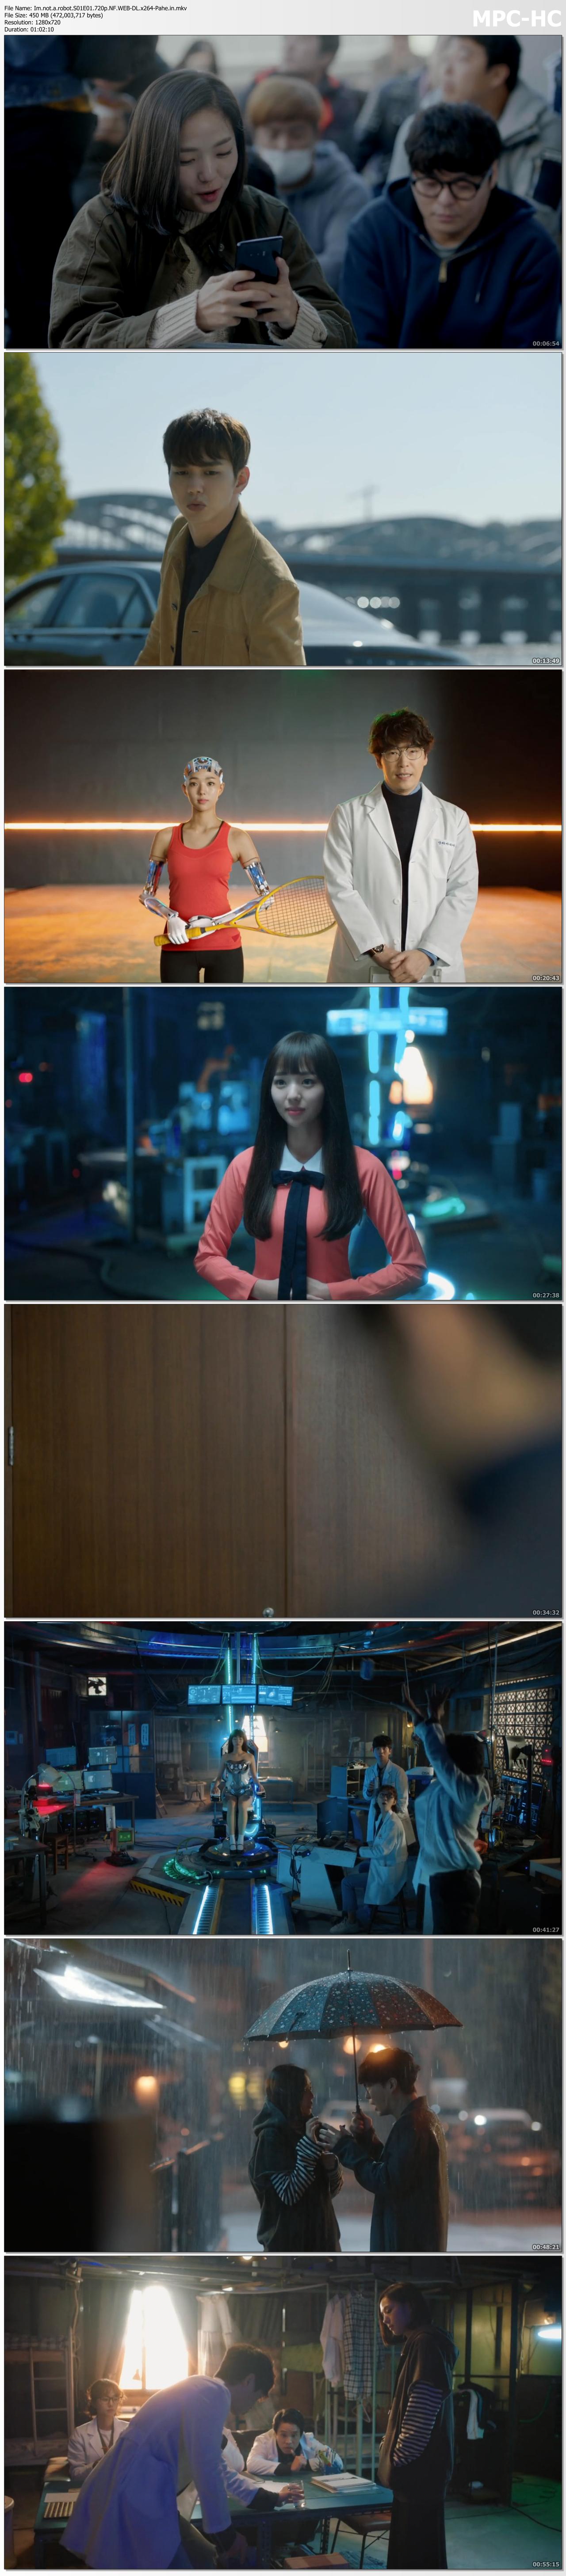 I'm Not a Robot Season 1 Complete NF WEB-DL 480p & 720p